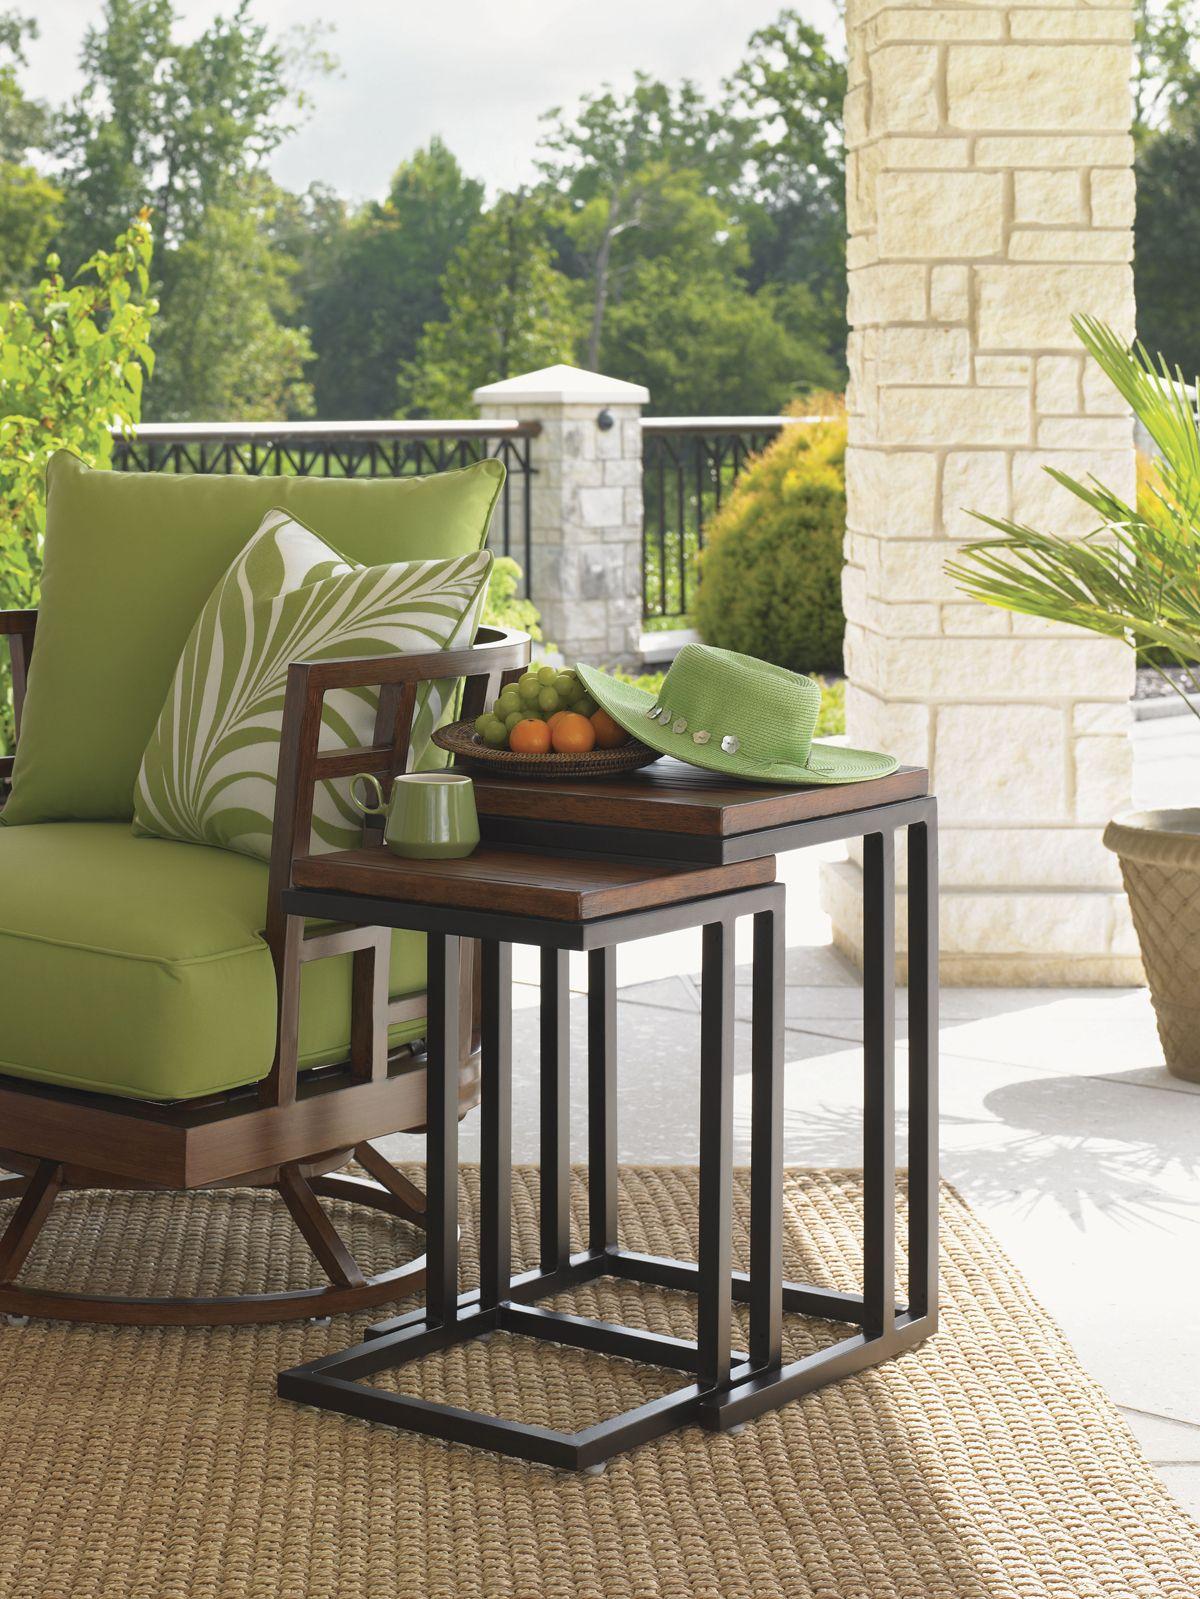 Ocean Club Pacifica Nesting Tables | Lexington Home Brands